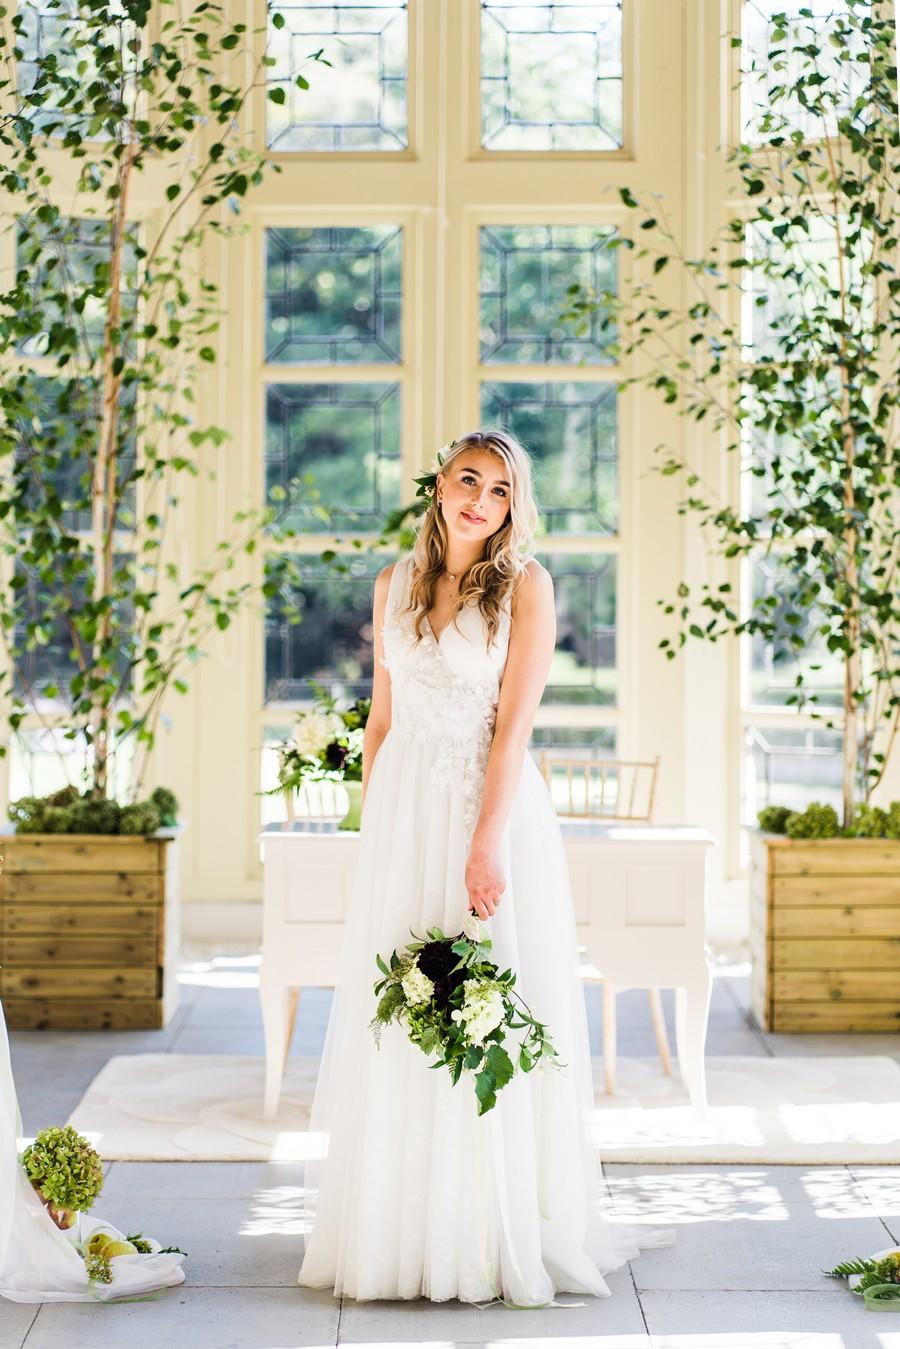 Highcliffe Castle wedding inspiration on the English Wedding Blog (17)